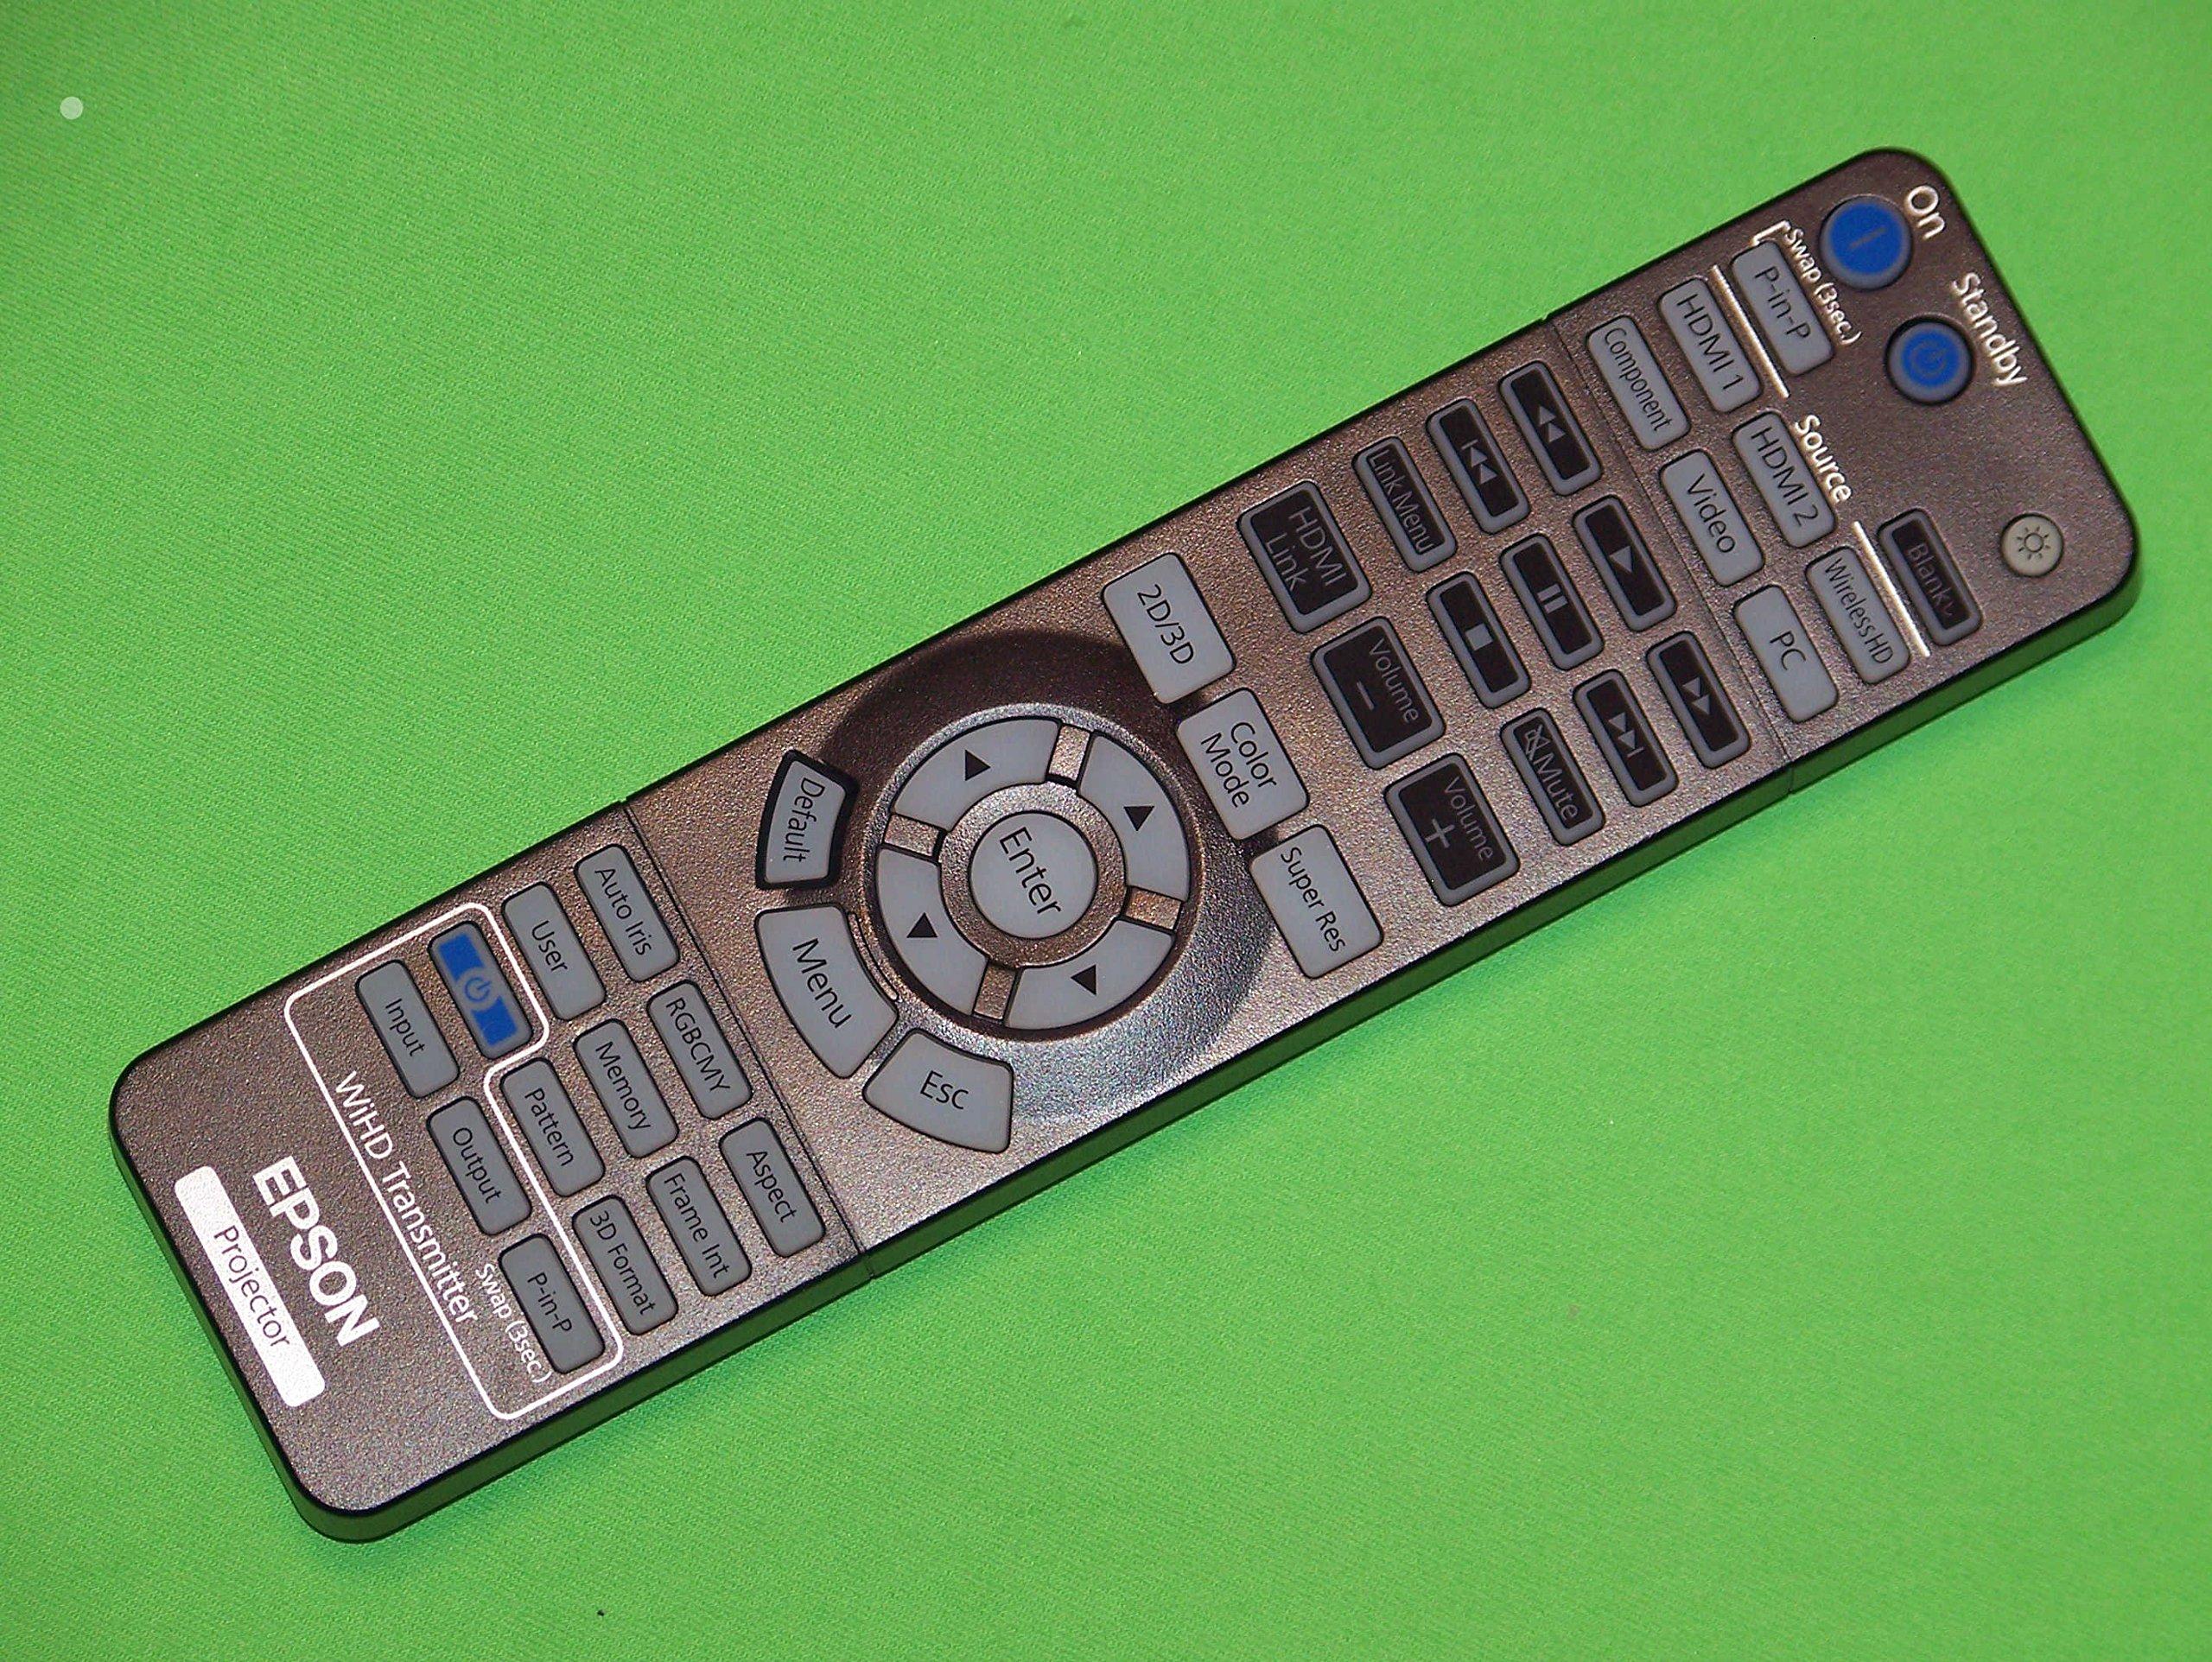 OEM Epson Remote Control: PowerLite Home Cinema 5025UB by Epson